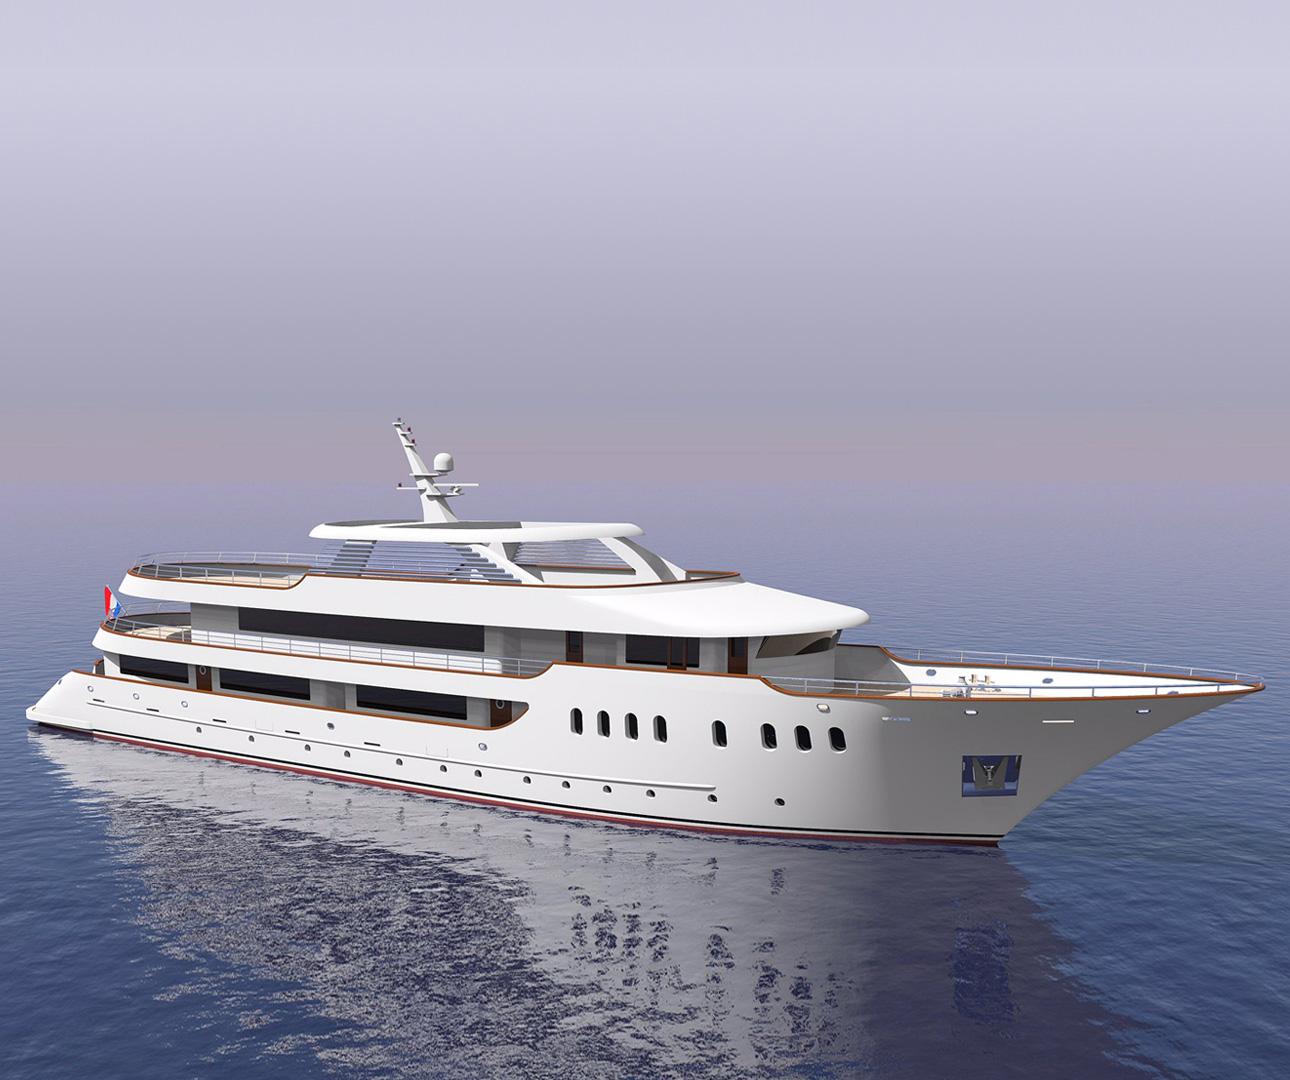 Set sail aboard the AVANGARD and explore beautiful Croatia